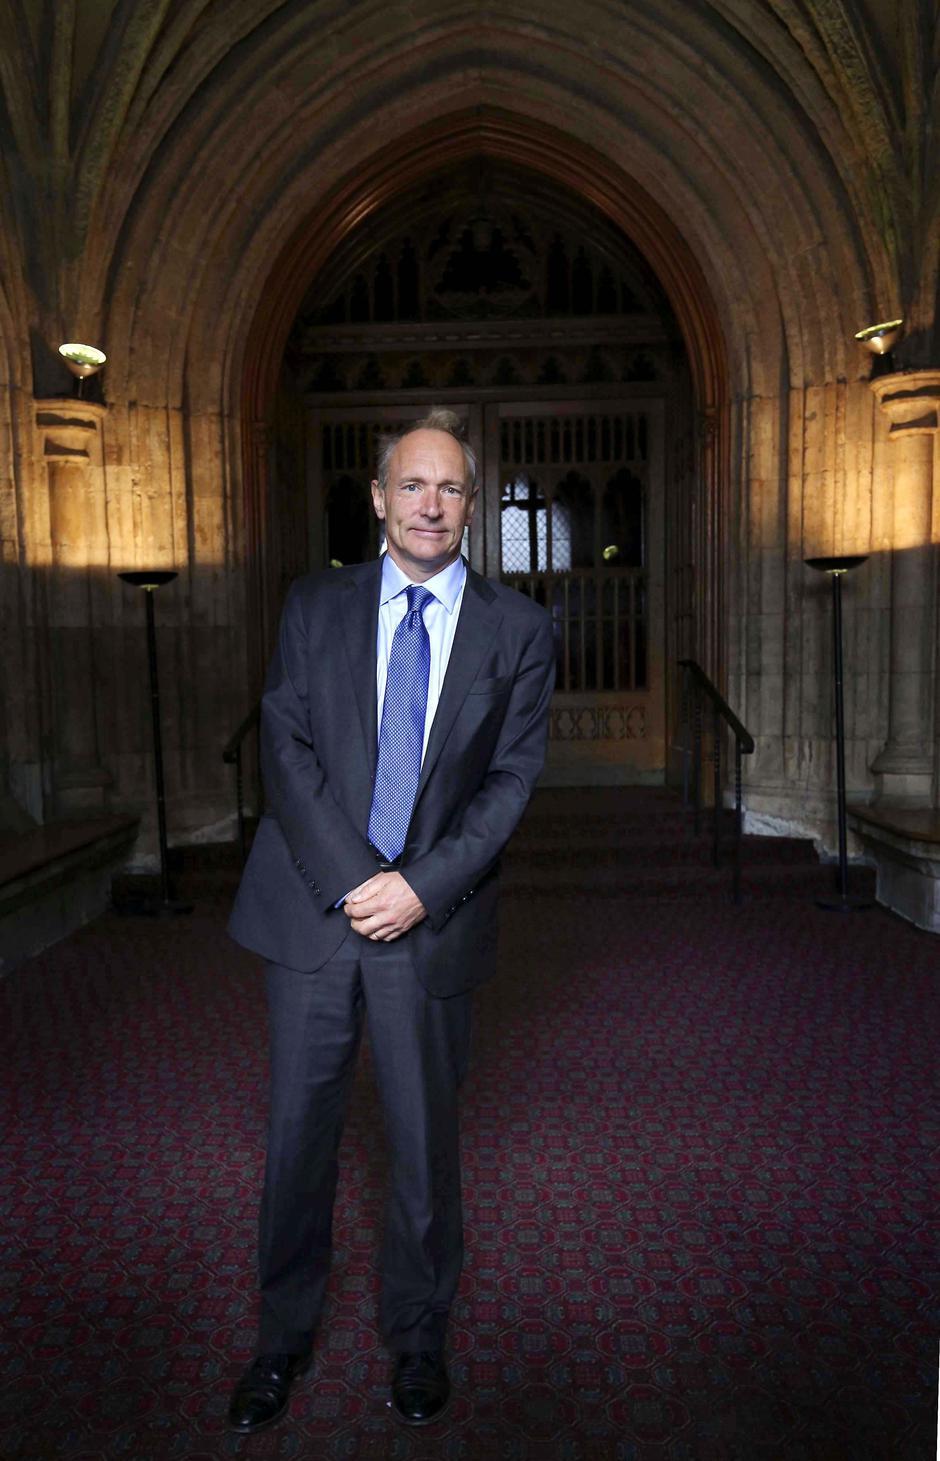 Tim Berners-Lee izumitelj world wide weba | Author: Philip Toscano/Press Association/PIXSELL